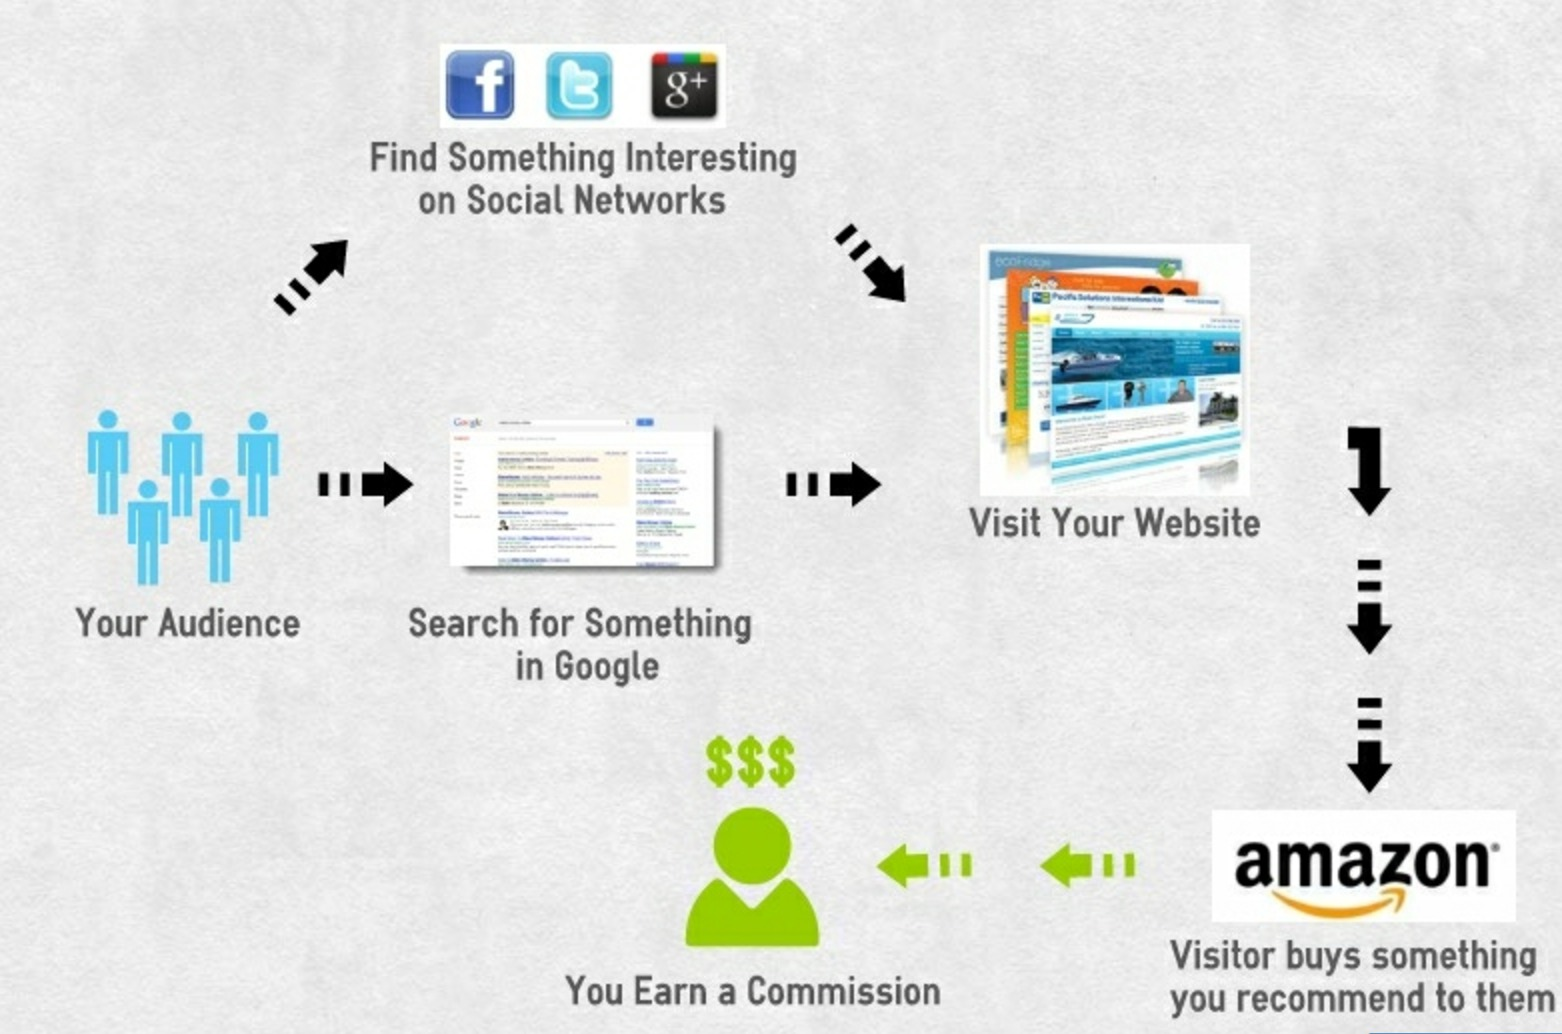 How making money online works